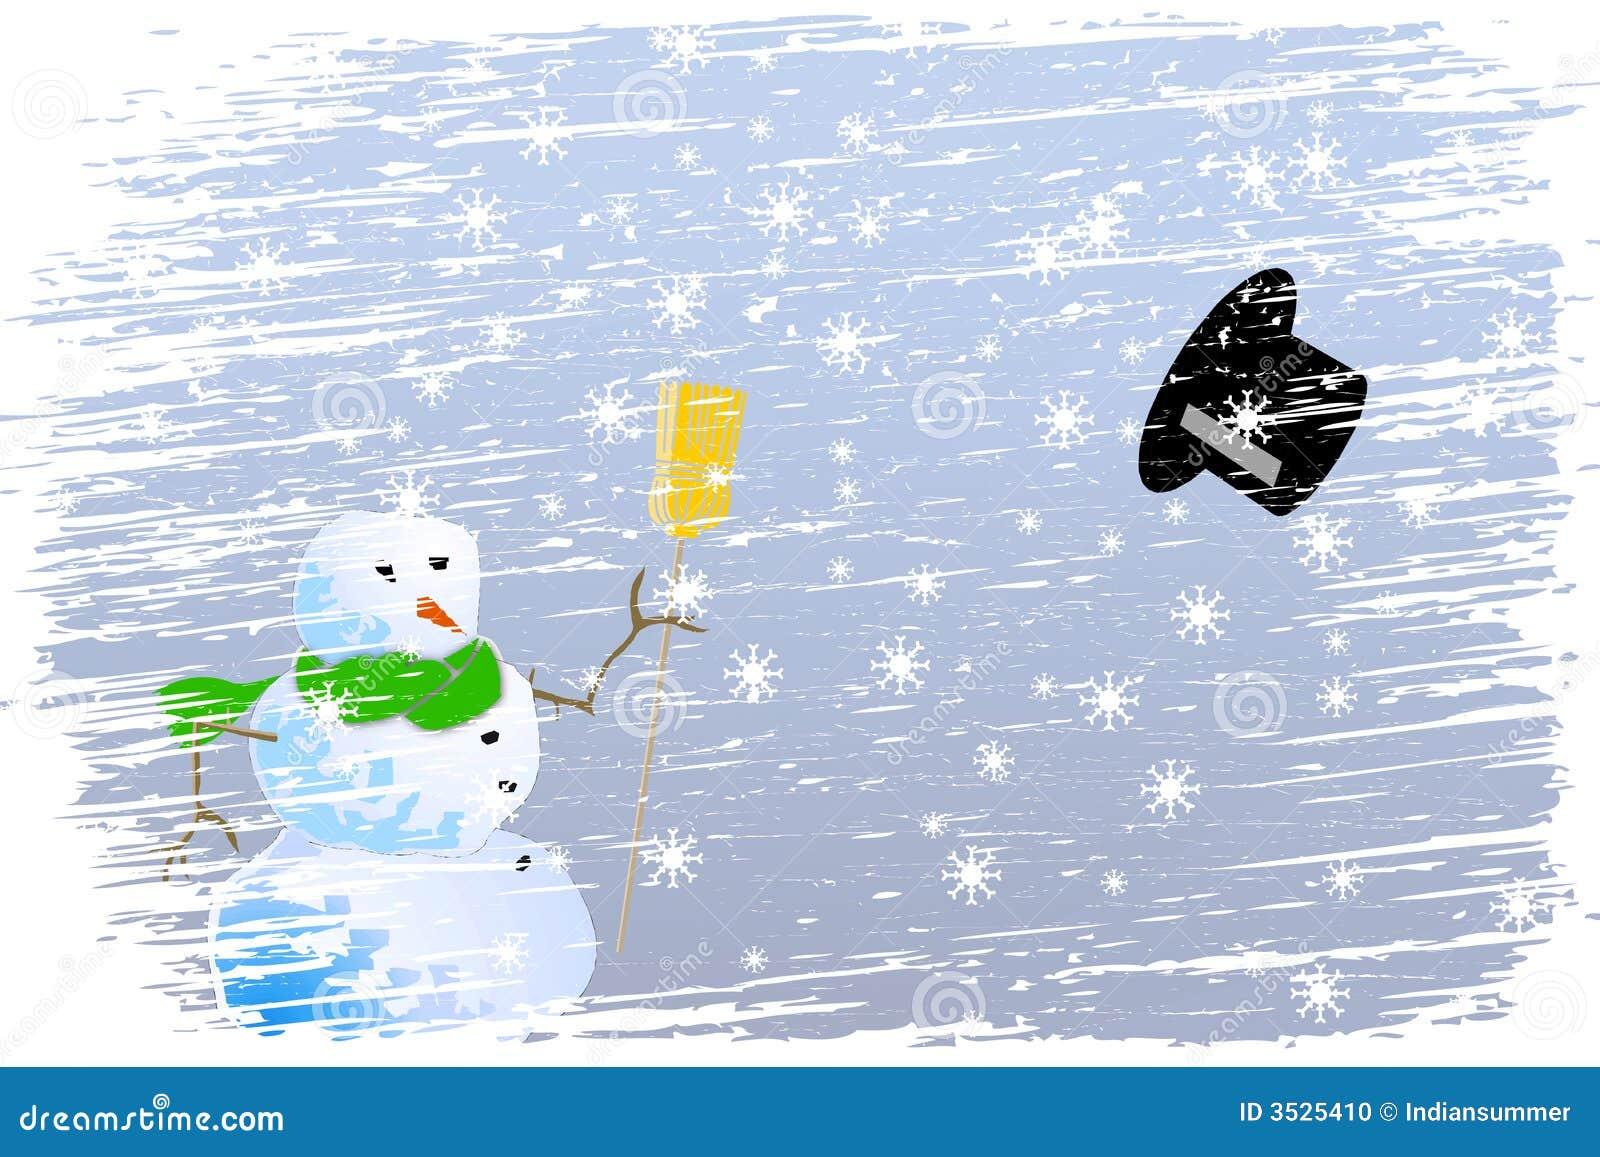 http://thumbs.dreamstime.com/z/happy-blizzard-christmas-3525410.jpg